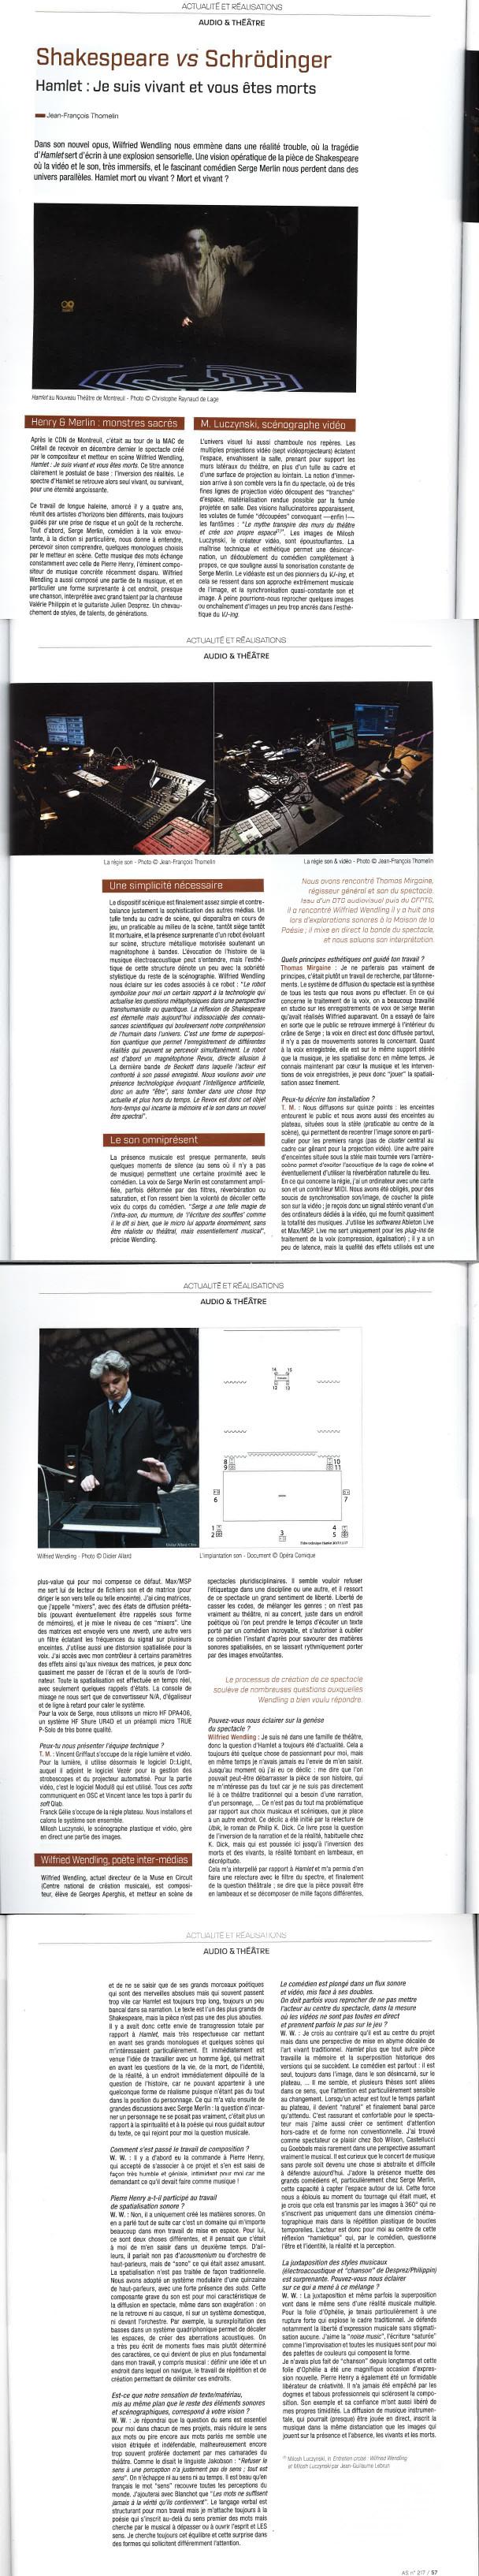 Actualite-Scenographie_Hamlet.jpg